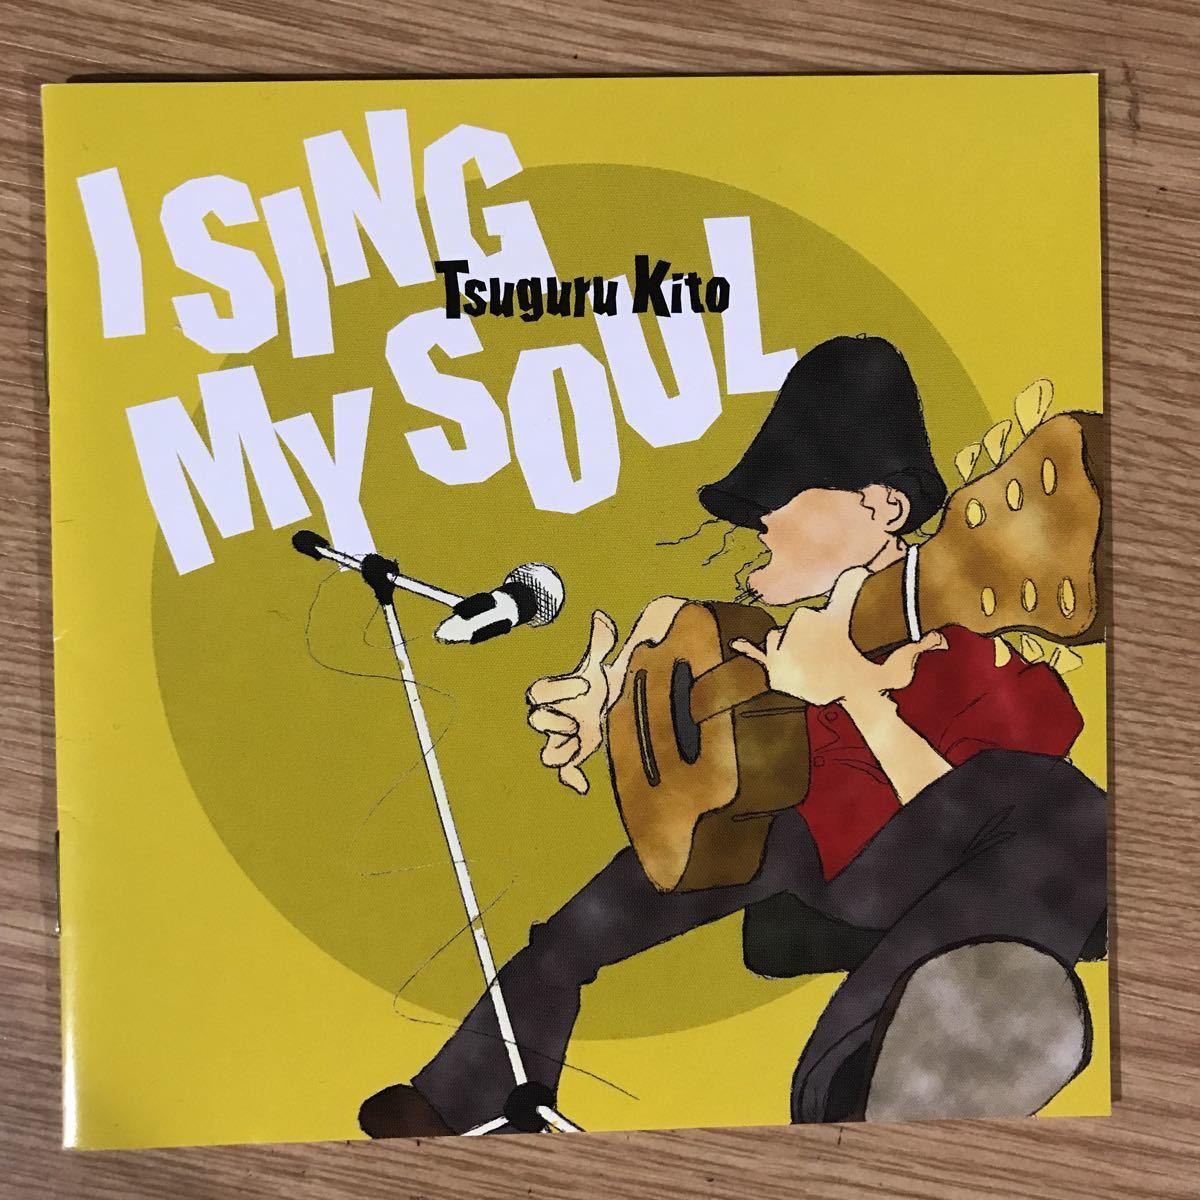 (B86)帯付 中古CD3000円 鬼頭つぐる I SING MY SOUL